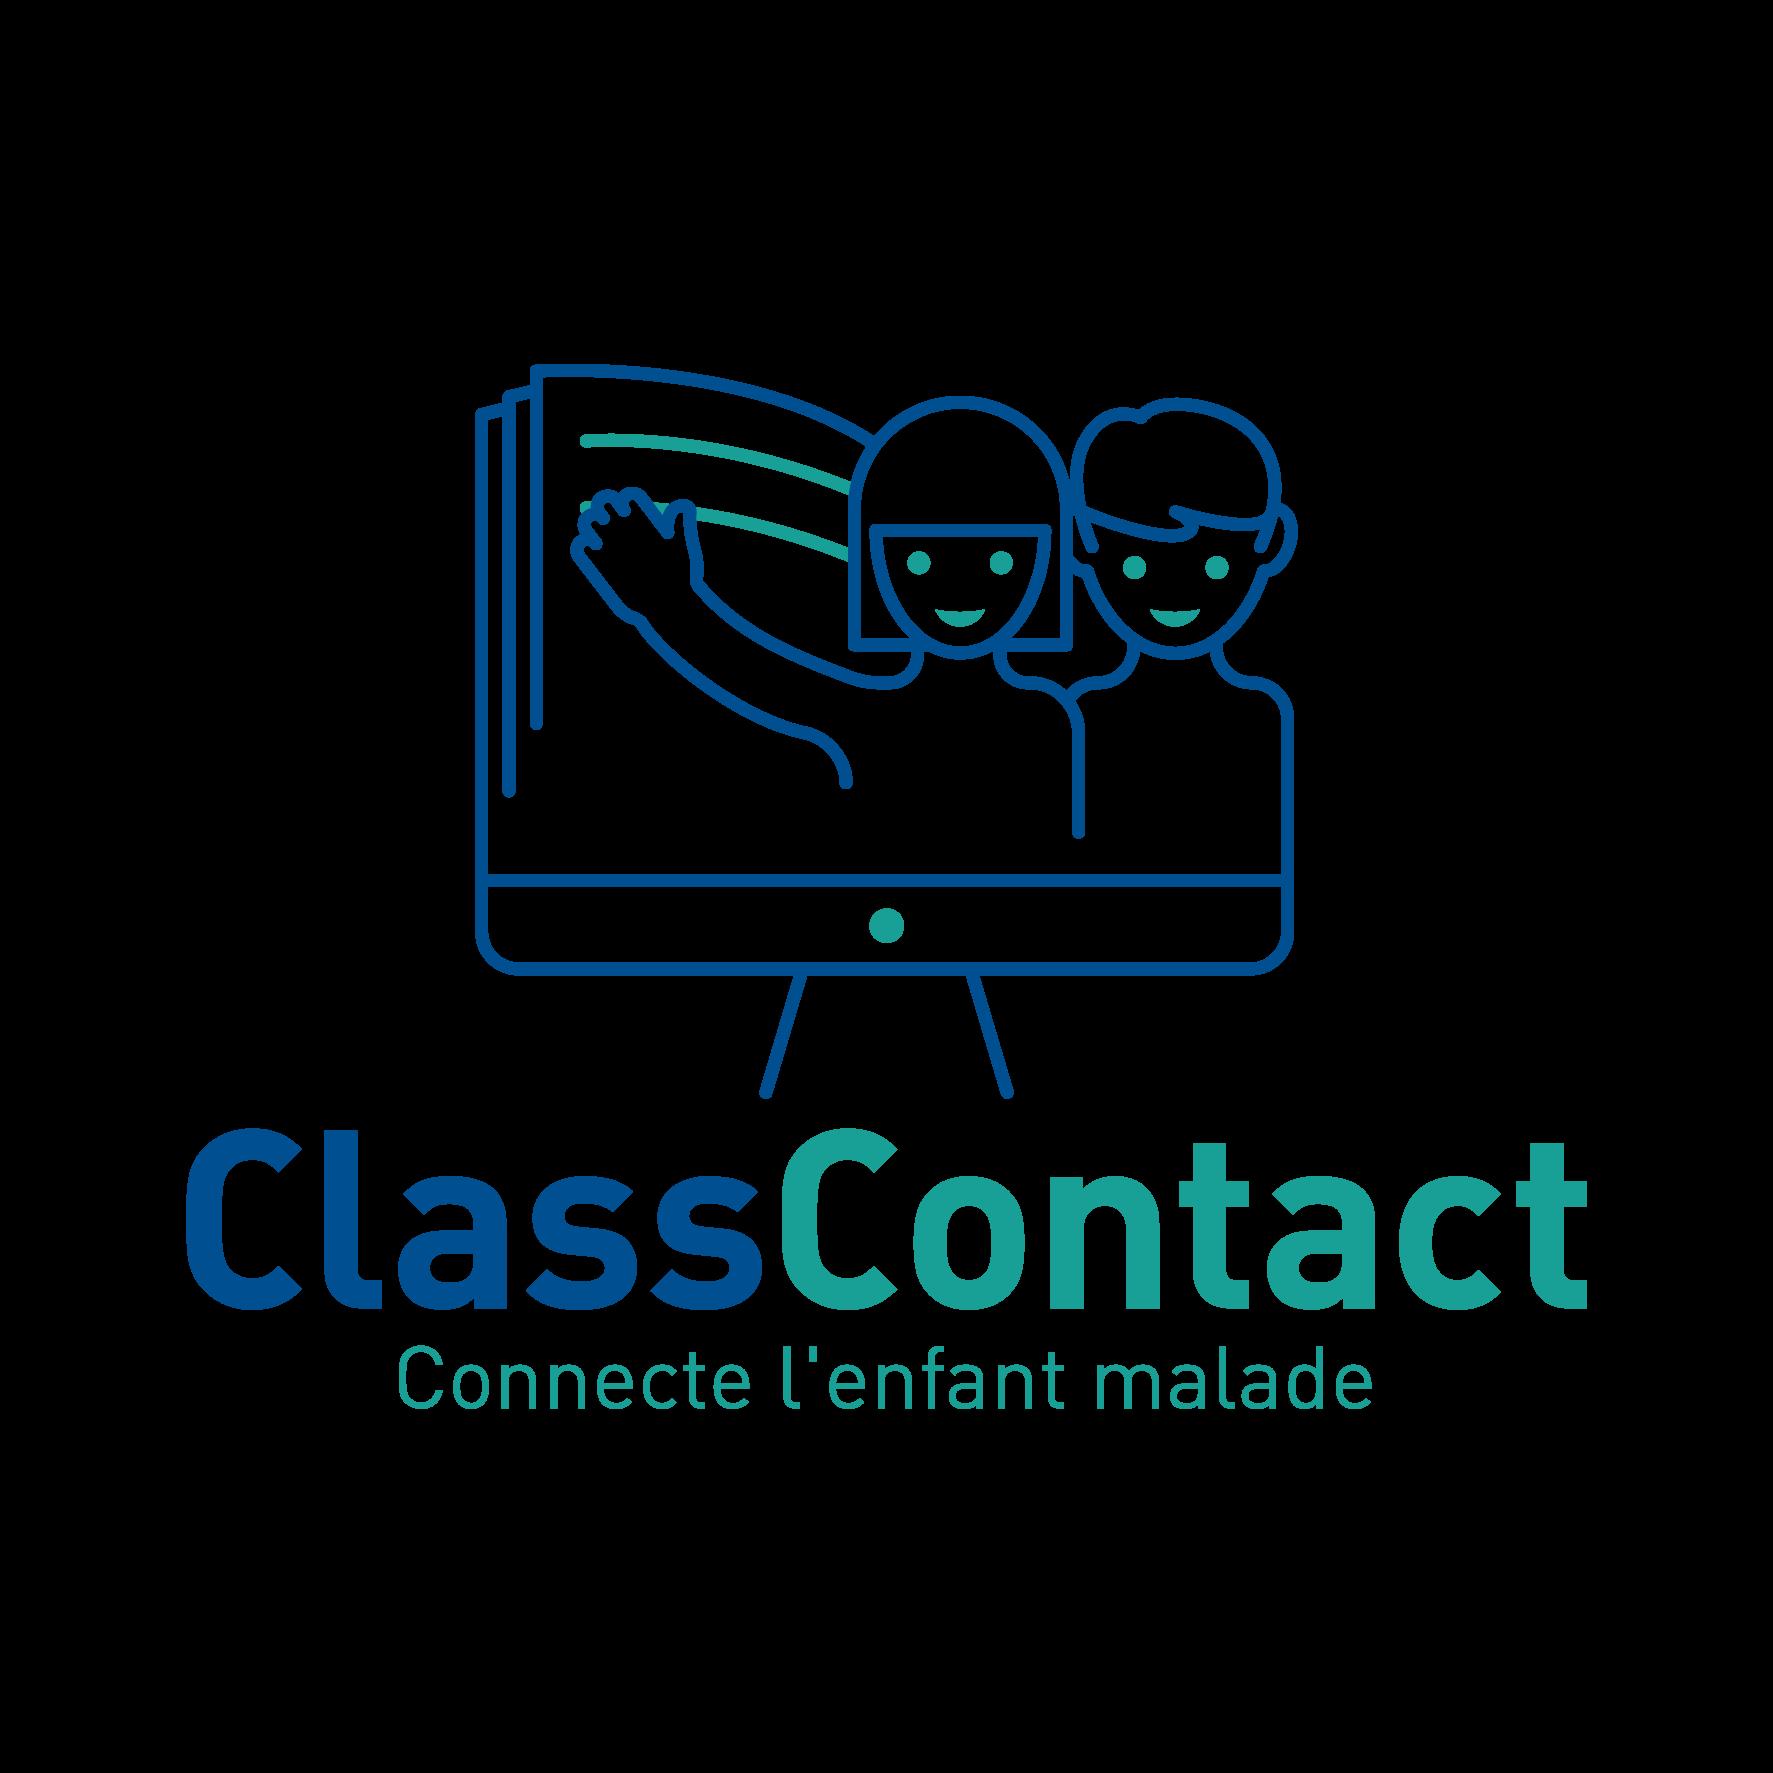 ClassContact